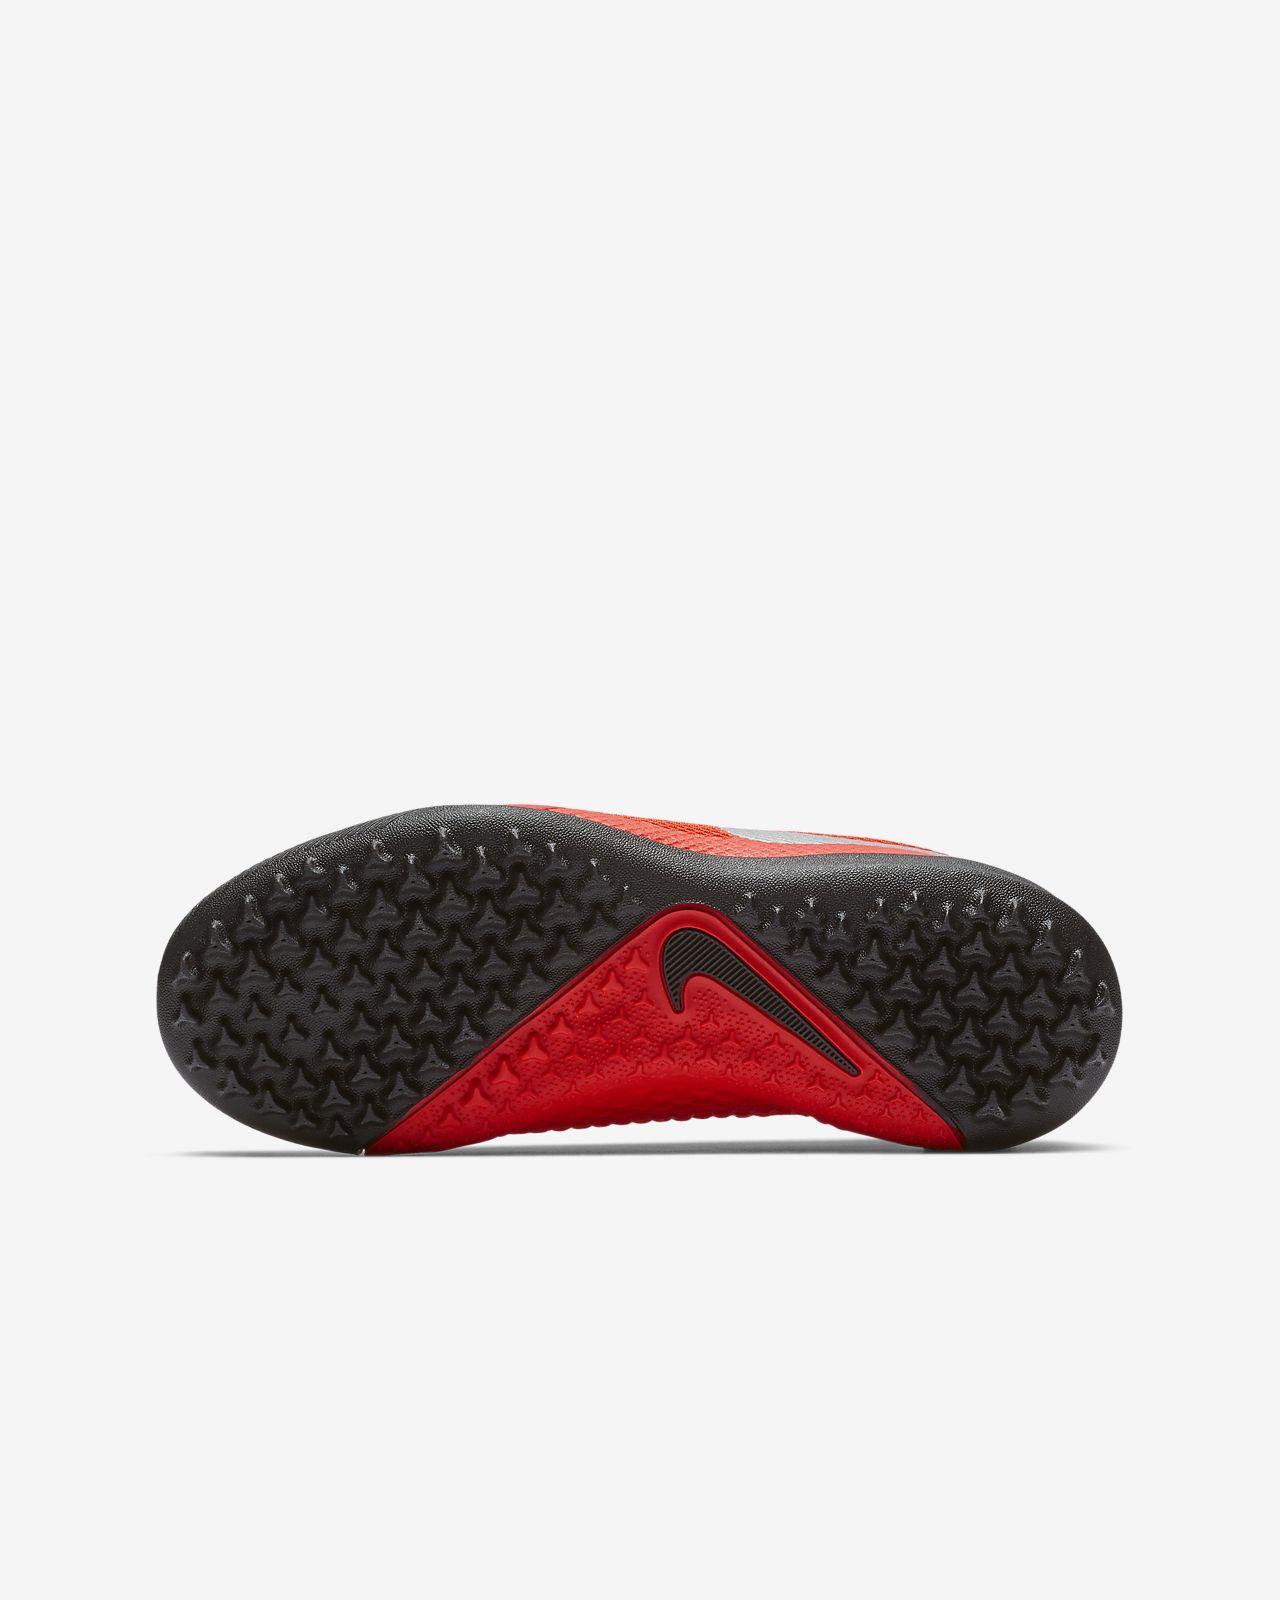 huge discount 3f9dc 706d3 ... Nike Jr. PhantomVSN Academy Game Over TF Younger Older Kids  Turf  Football Shoe